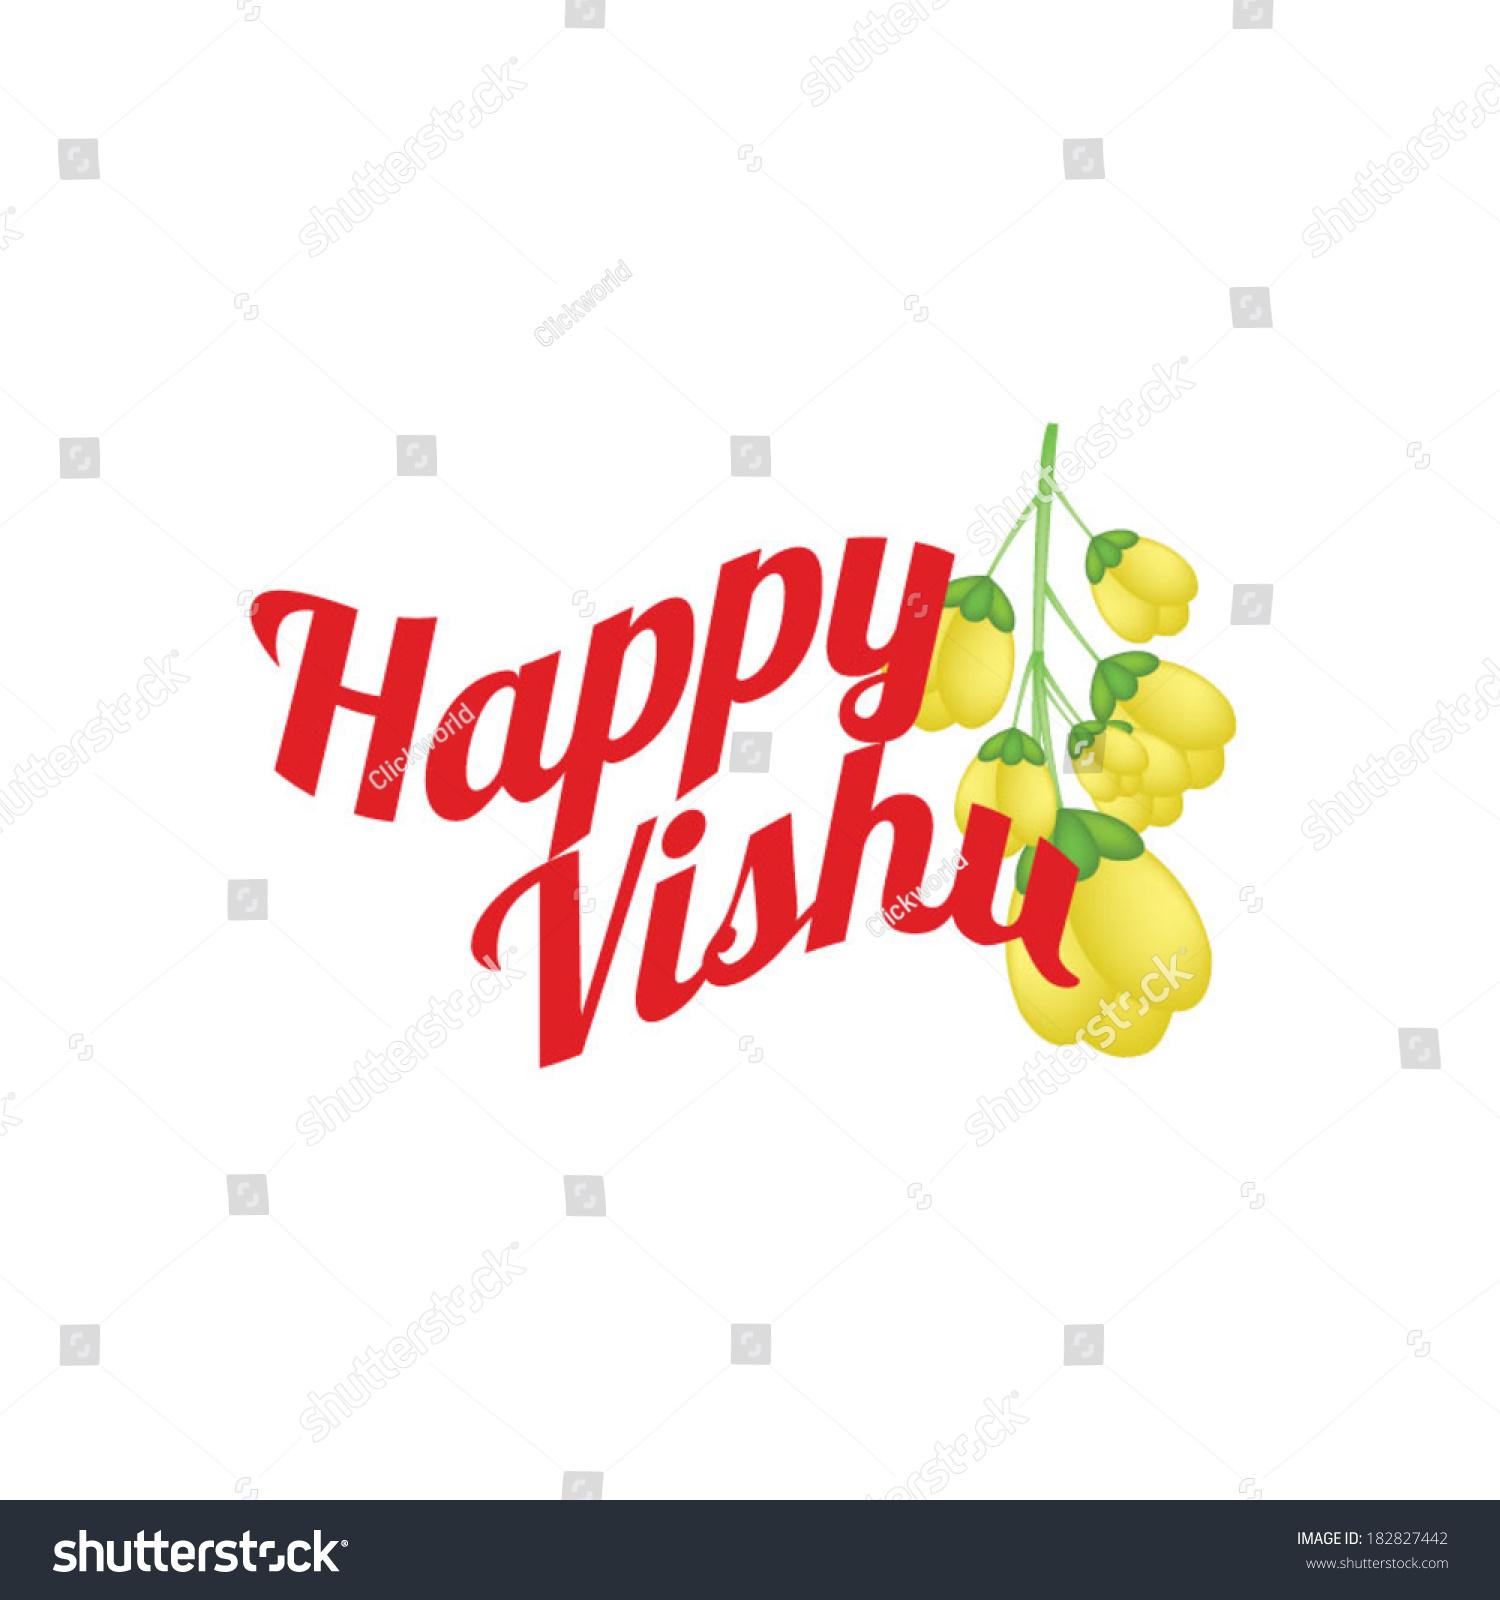 Happy Vishu Indian Festival Stock Vector Royalty Free 182827442